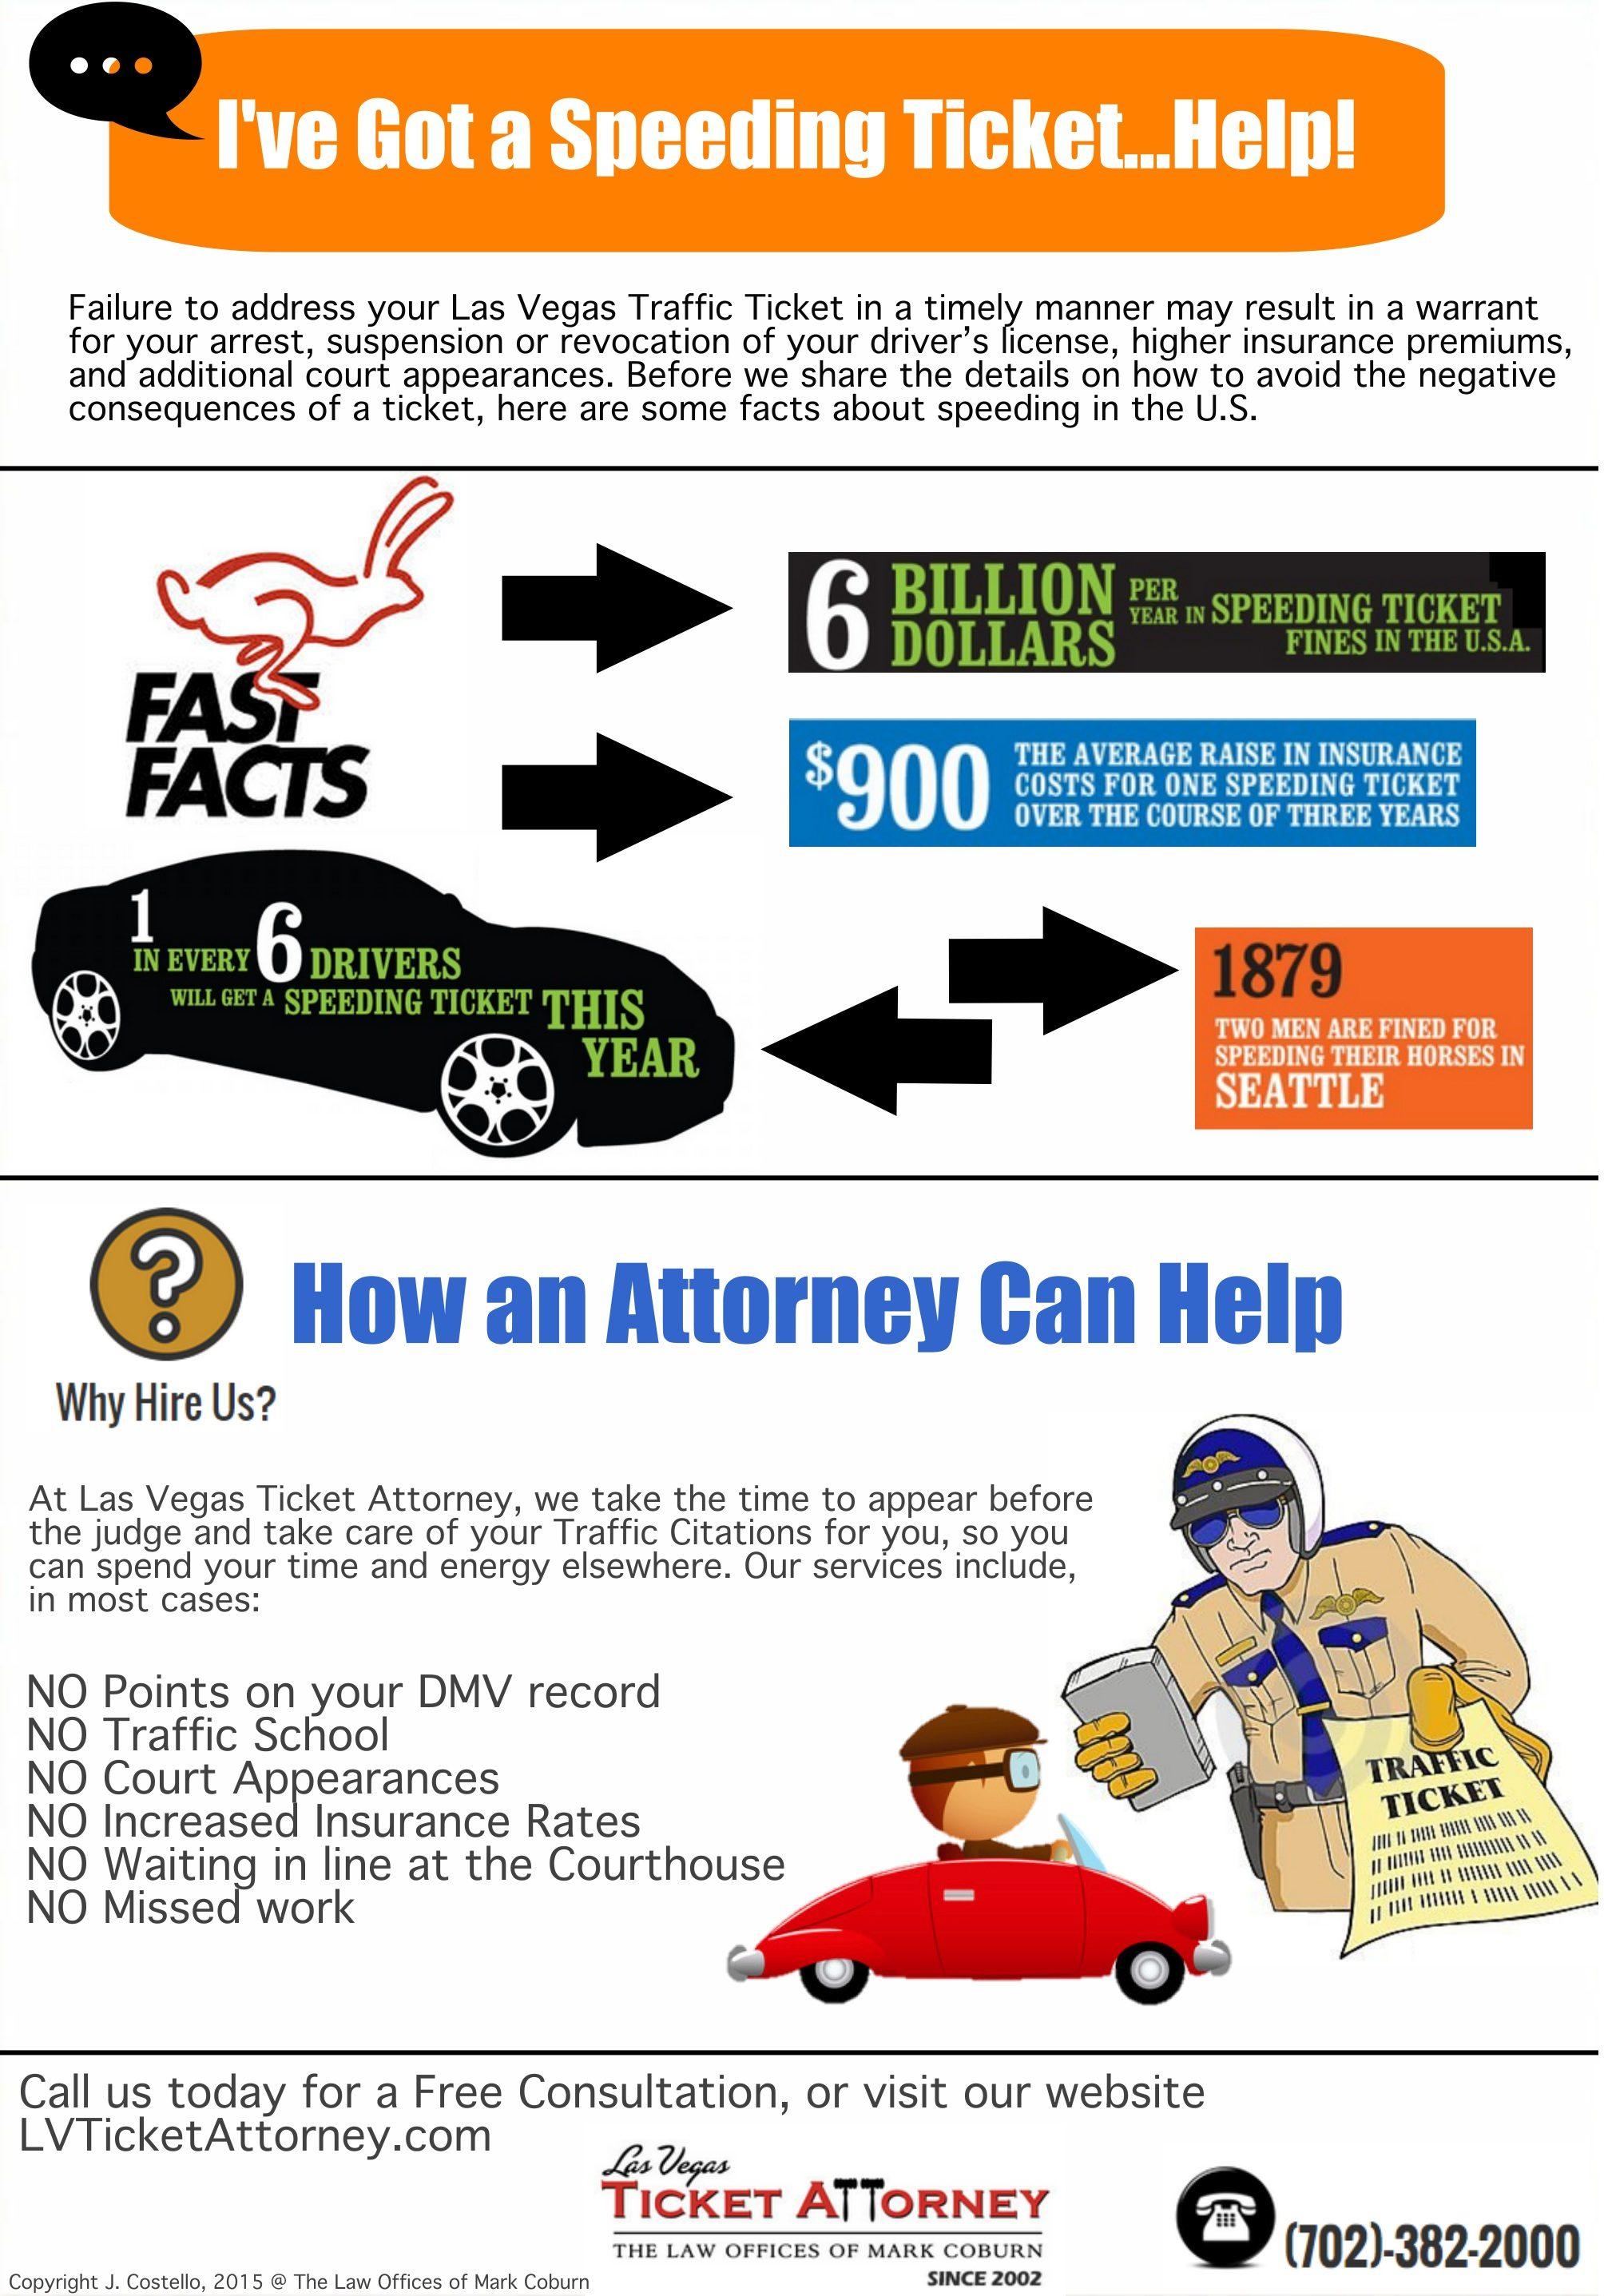 Las Vegas Speeding Ticket Infographic